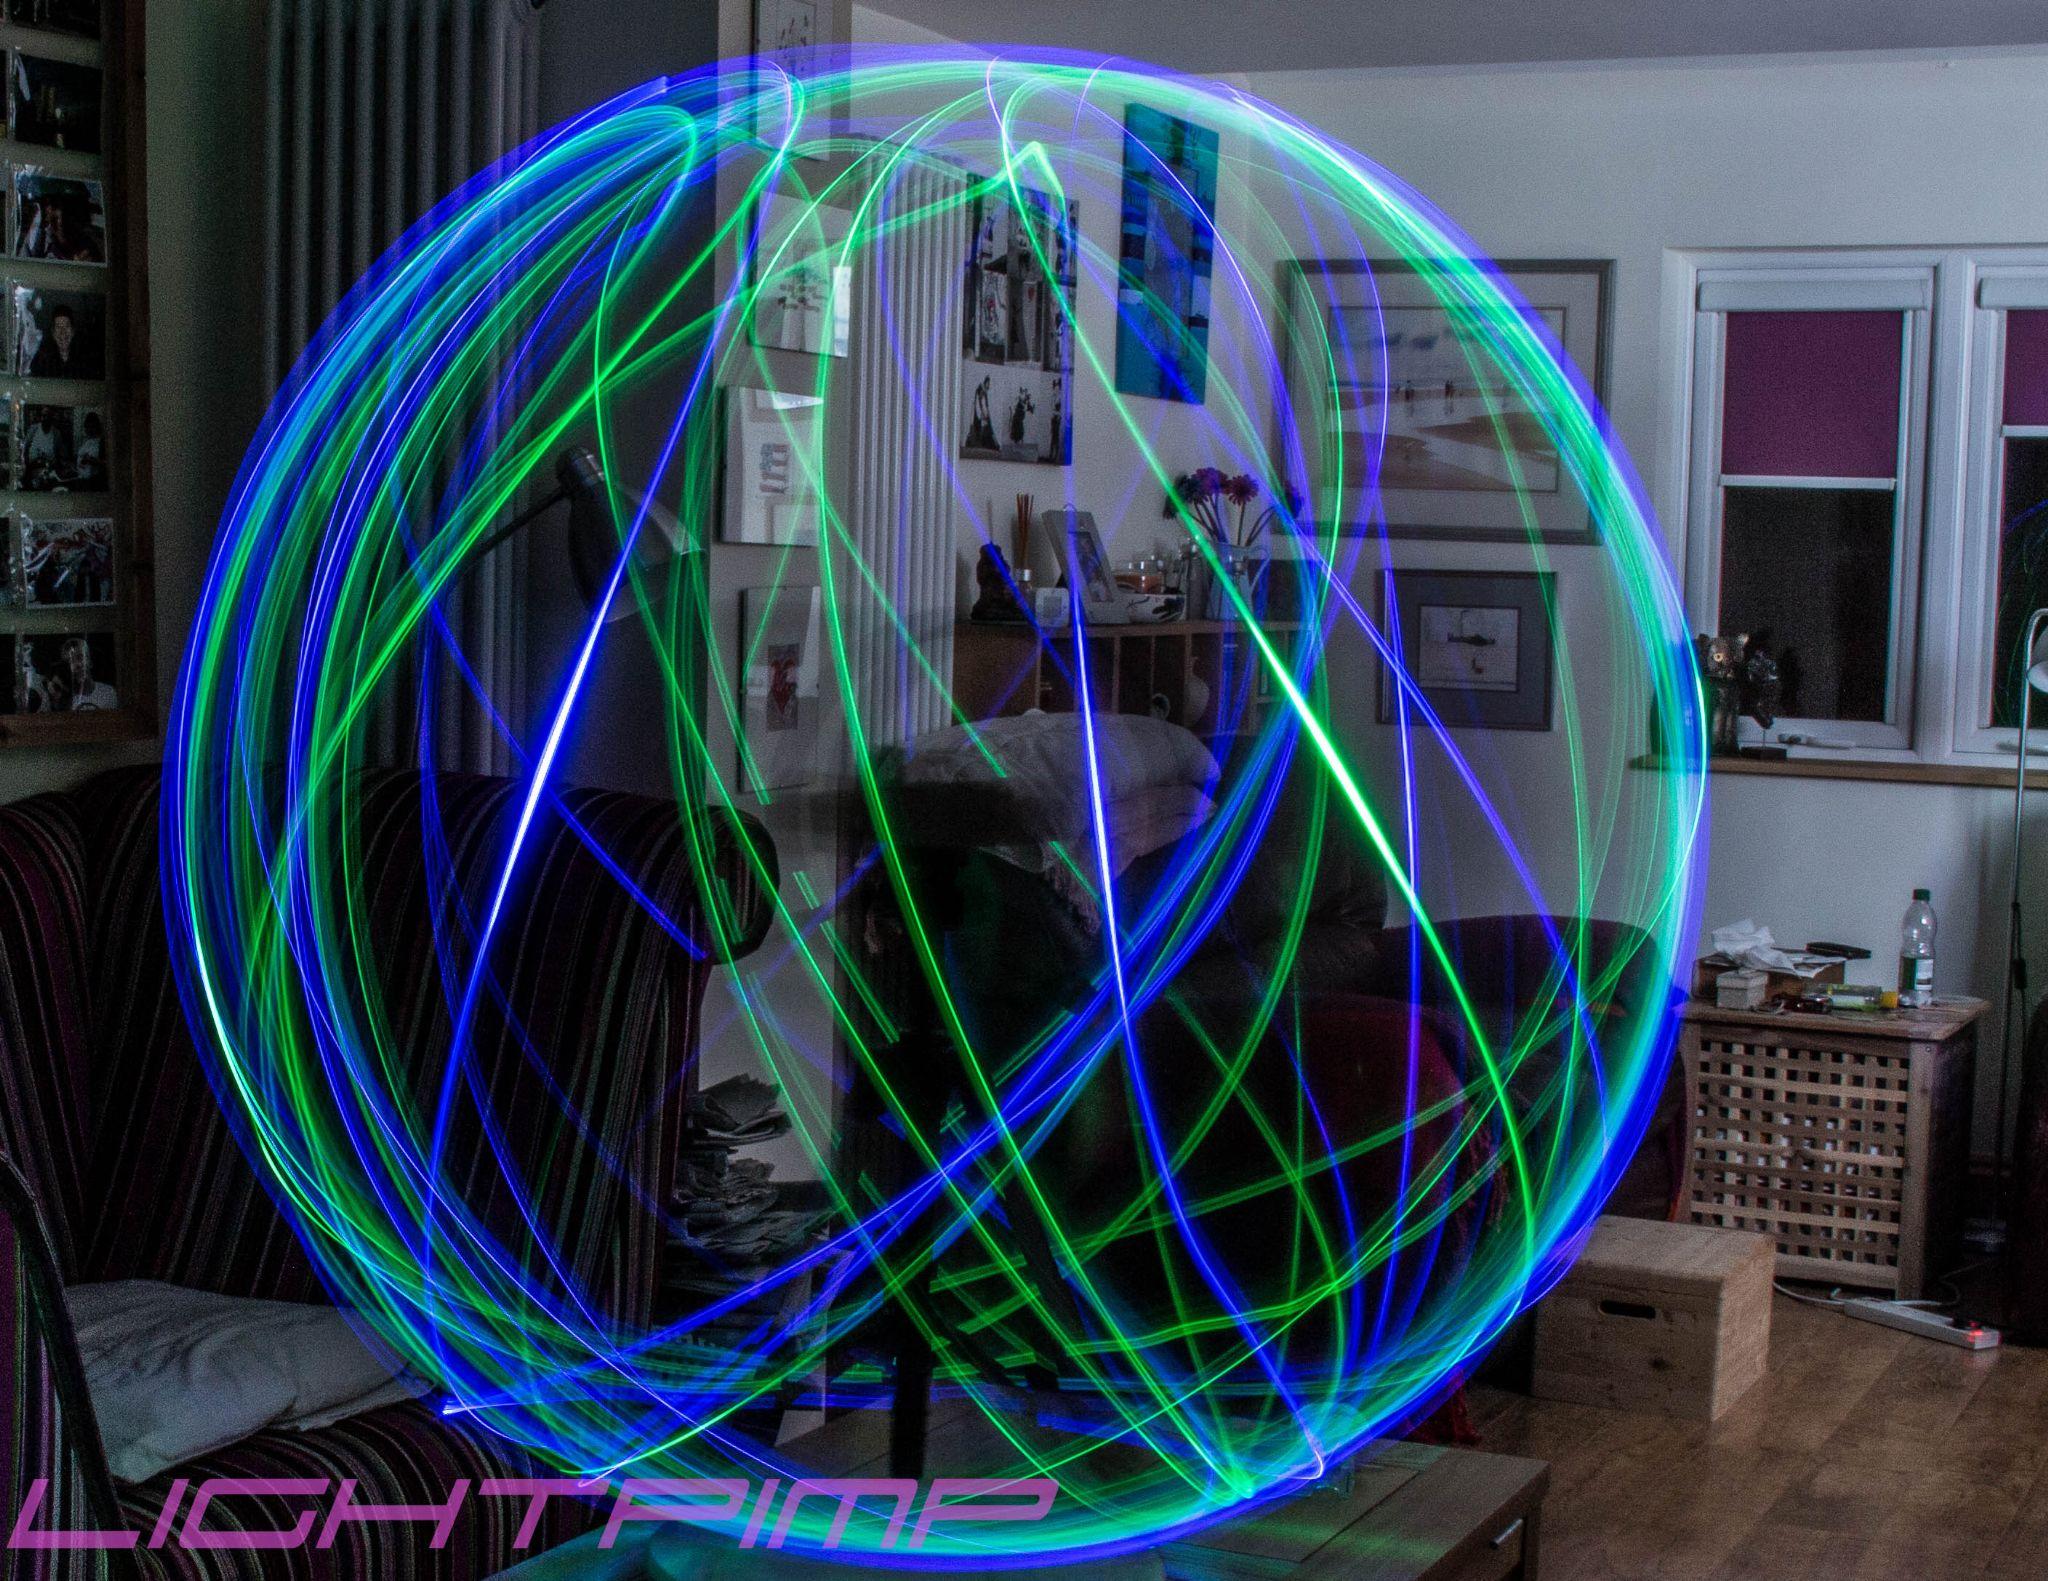 Living Room Light by Lightpimp - akadodjer